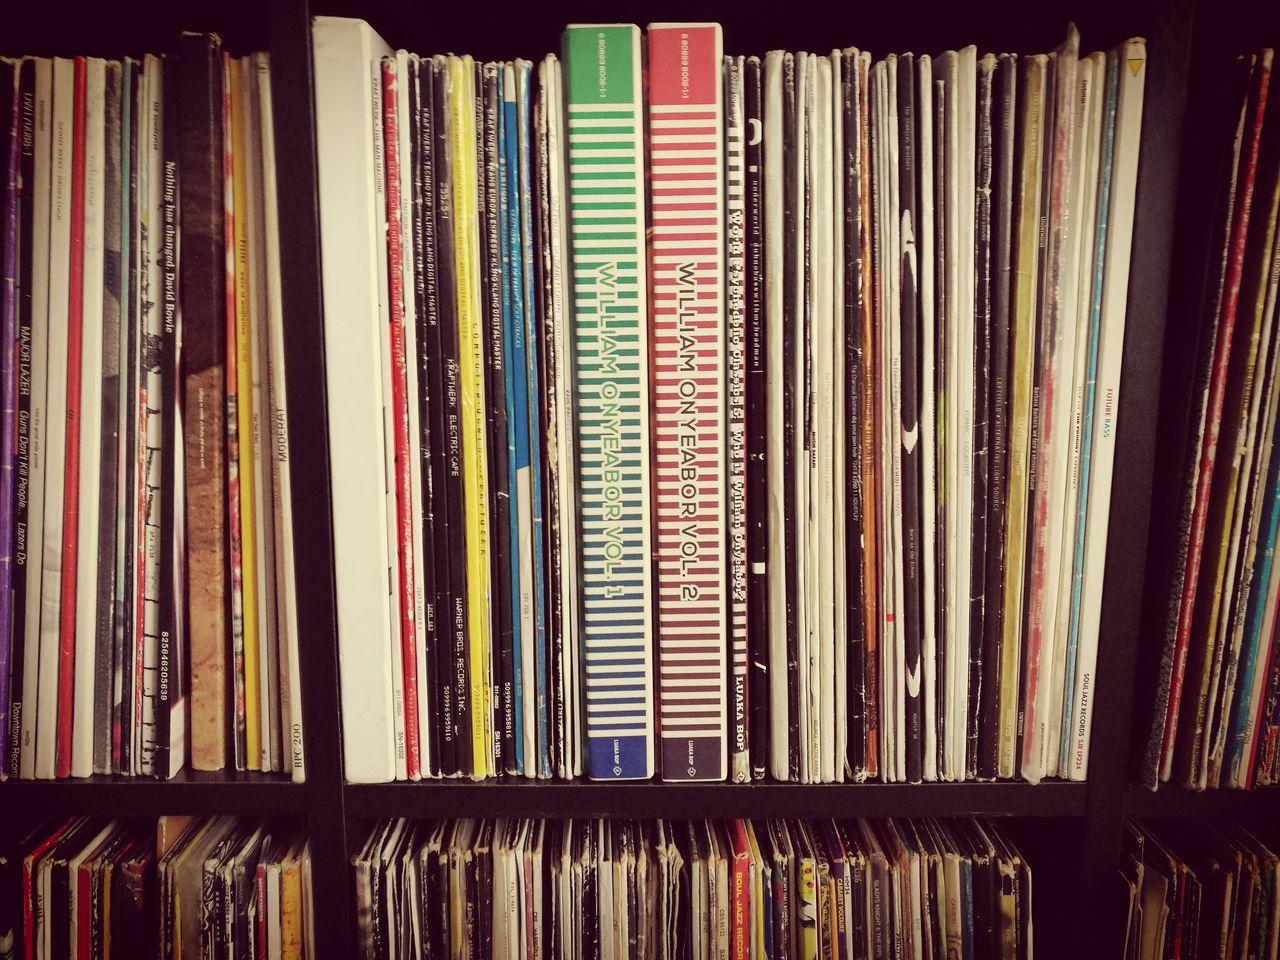 Vinyl Addict Music Vinyl Lover IKEA Ikea Design Vinylcollector Vinyl Records Vinyl Records Vinyl Love Onyeabor